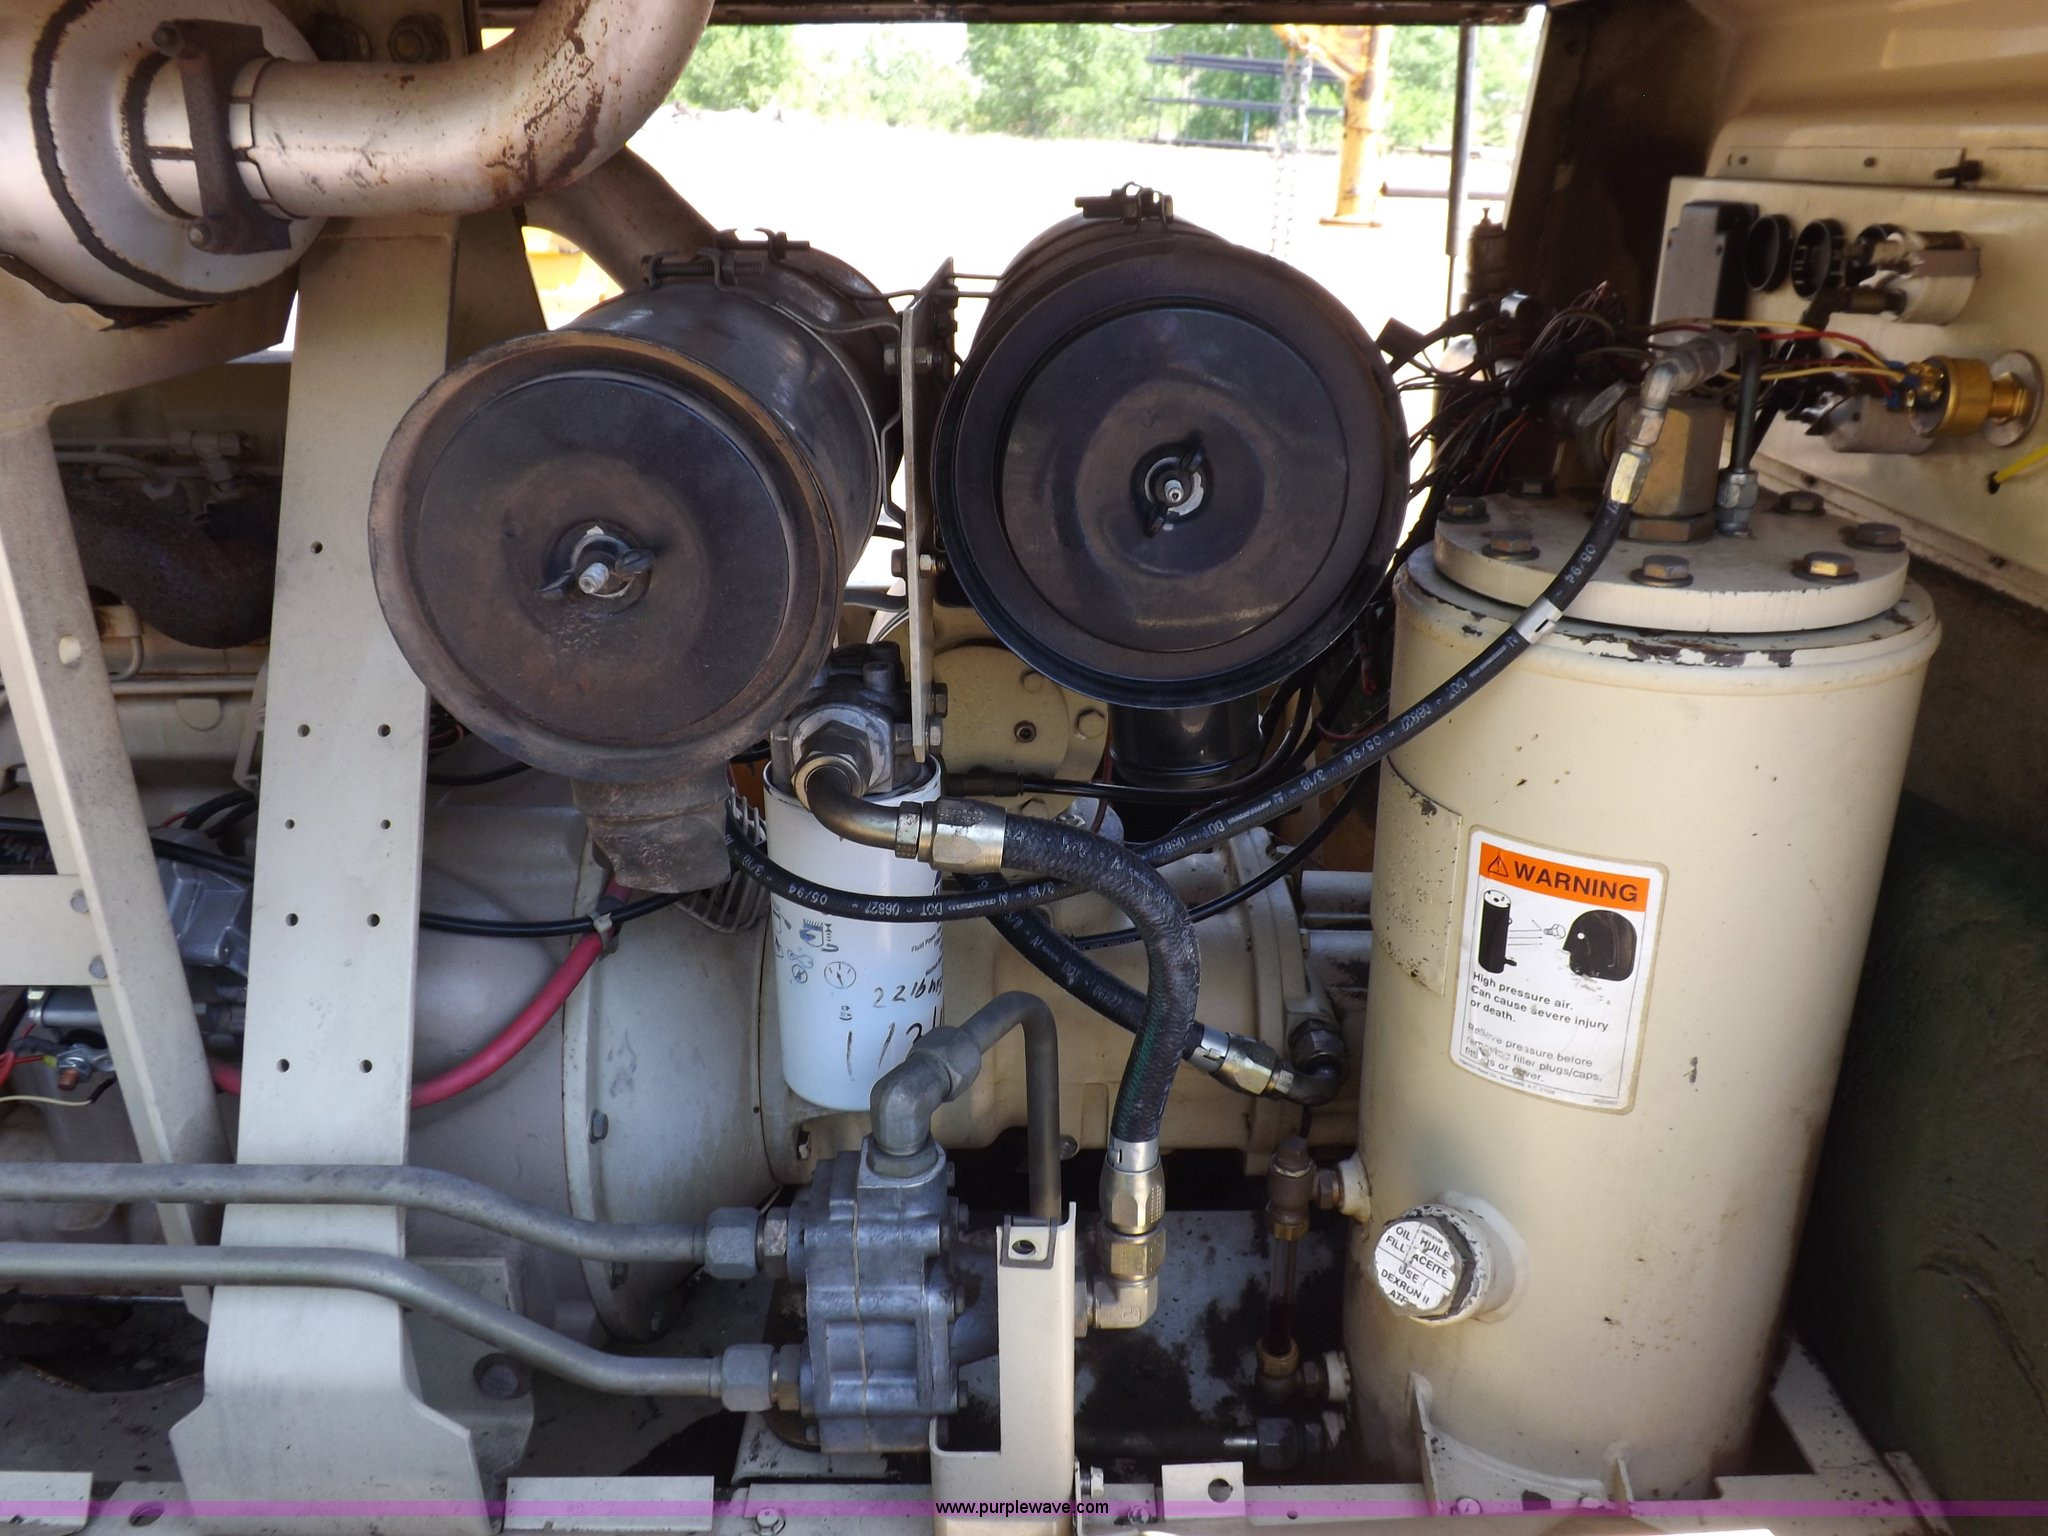 ... Ingersoll Rand P250WJD air compressor Full size in new window ...